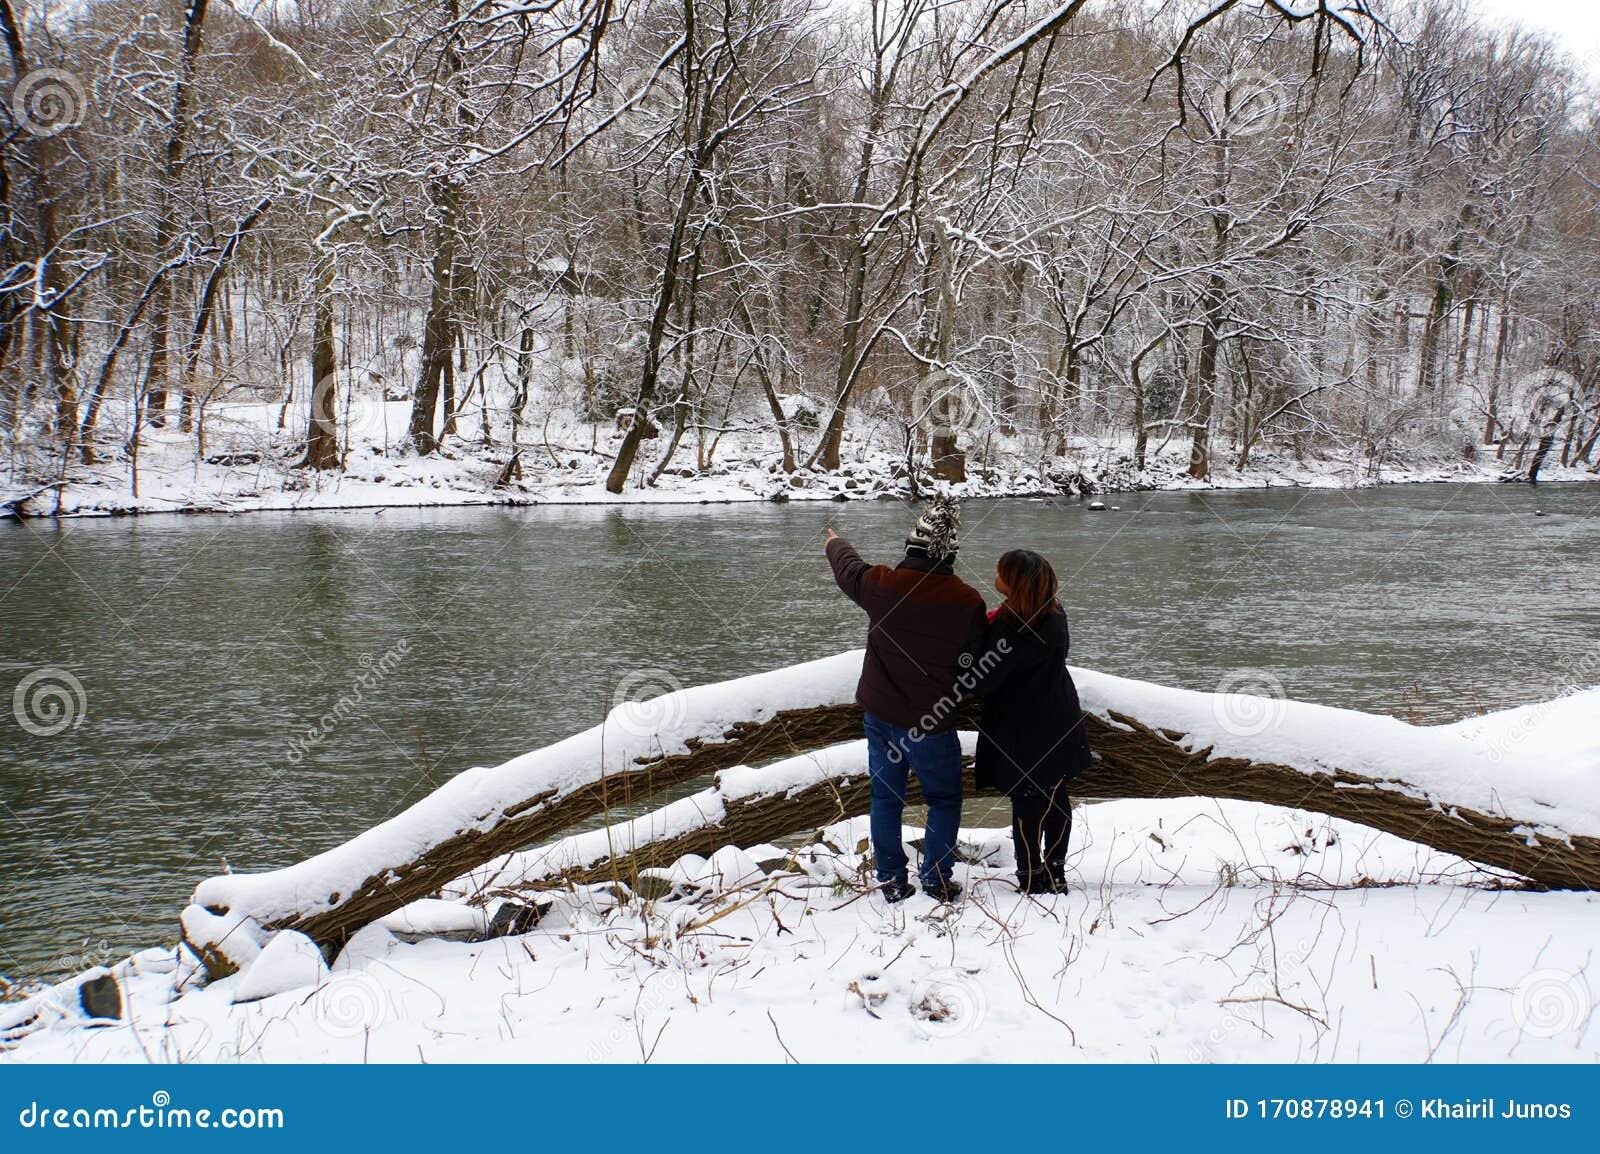 albanian dating sites